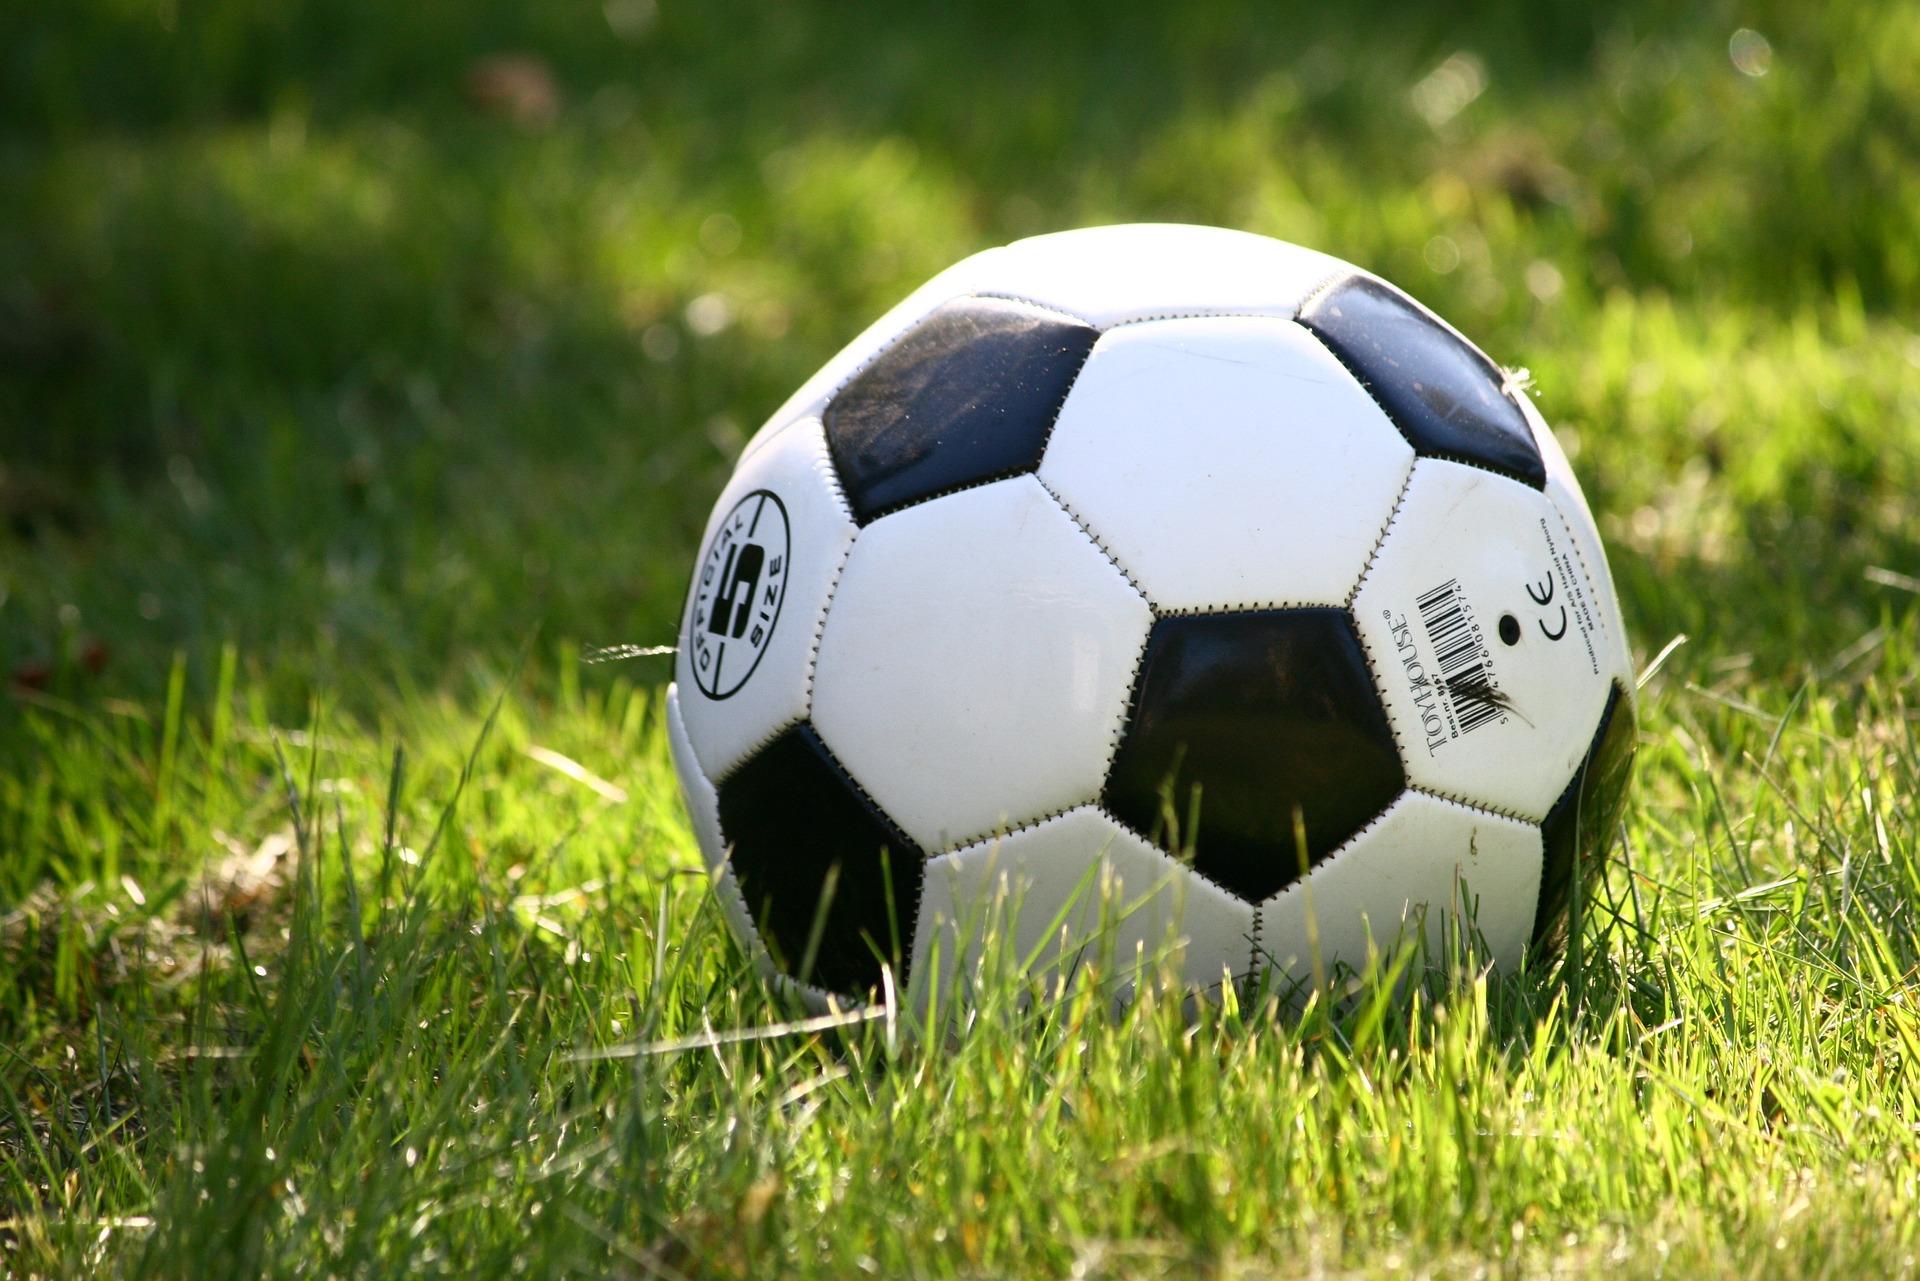 2019 Georgia High School Soccer All-Star Games – DiVarsity